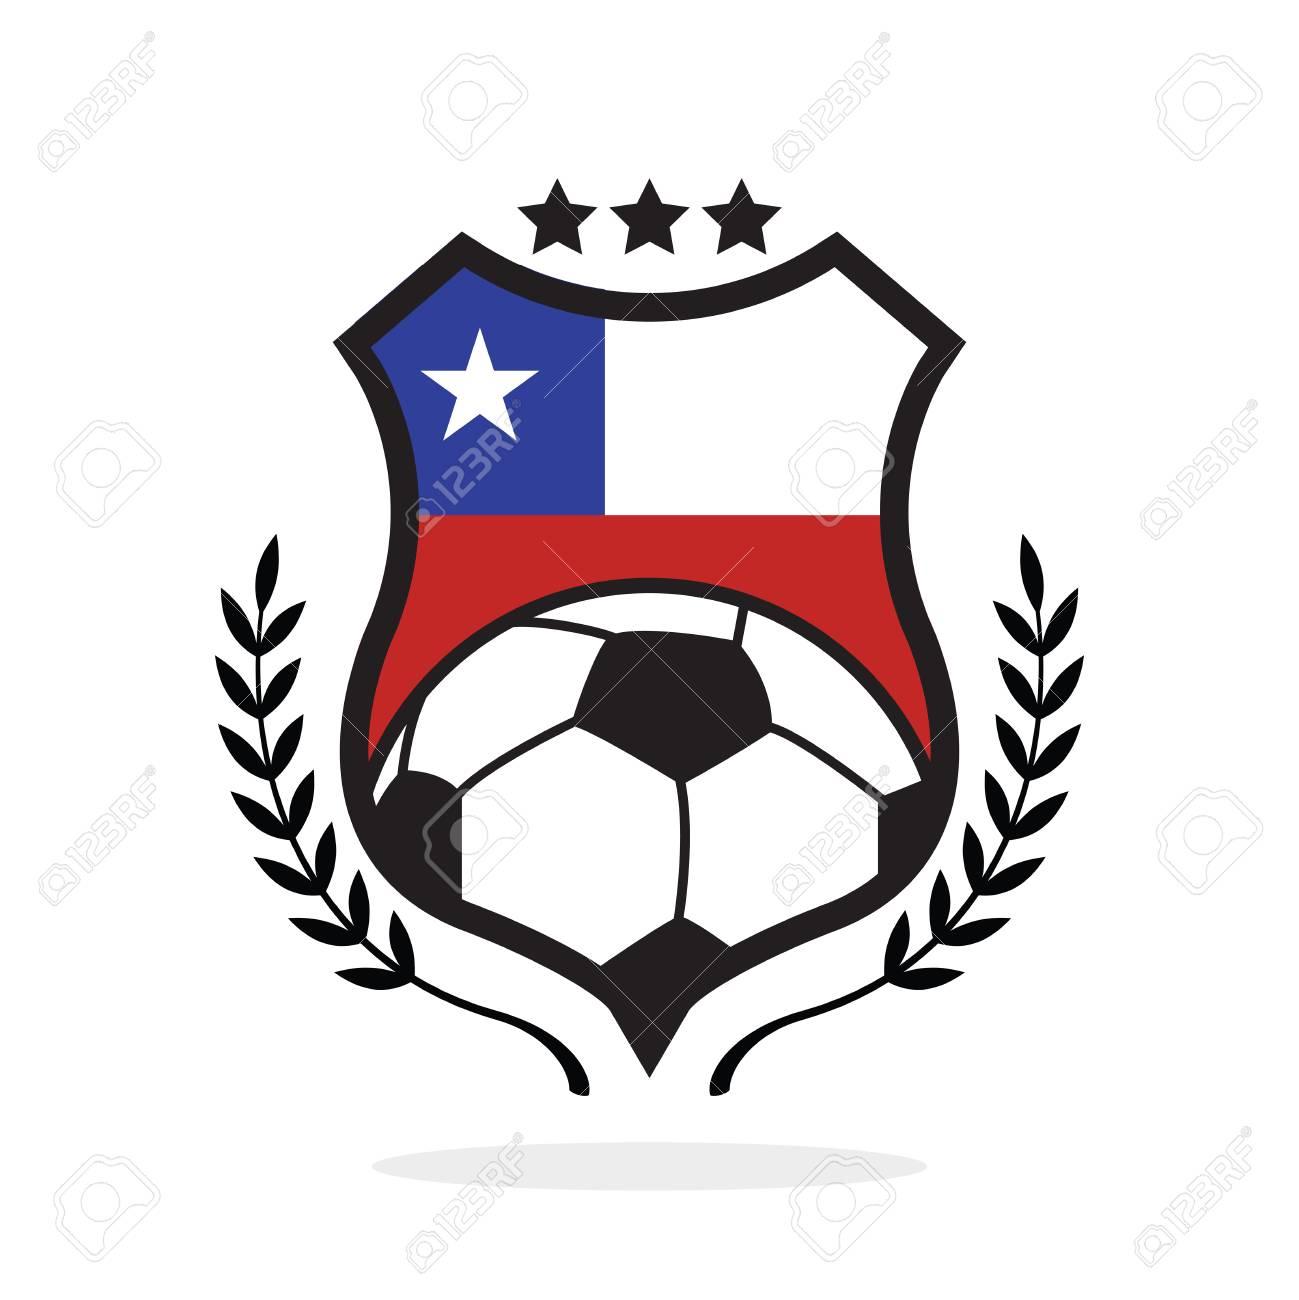 chile national flag football crest a logo type illustration royalty rh 123rf com honduras soccer badge dream league soccer honduras logo